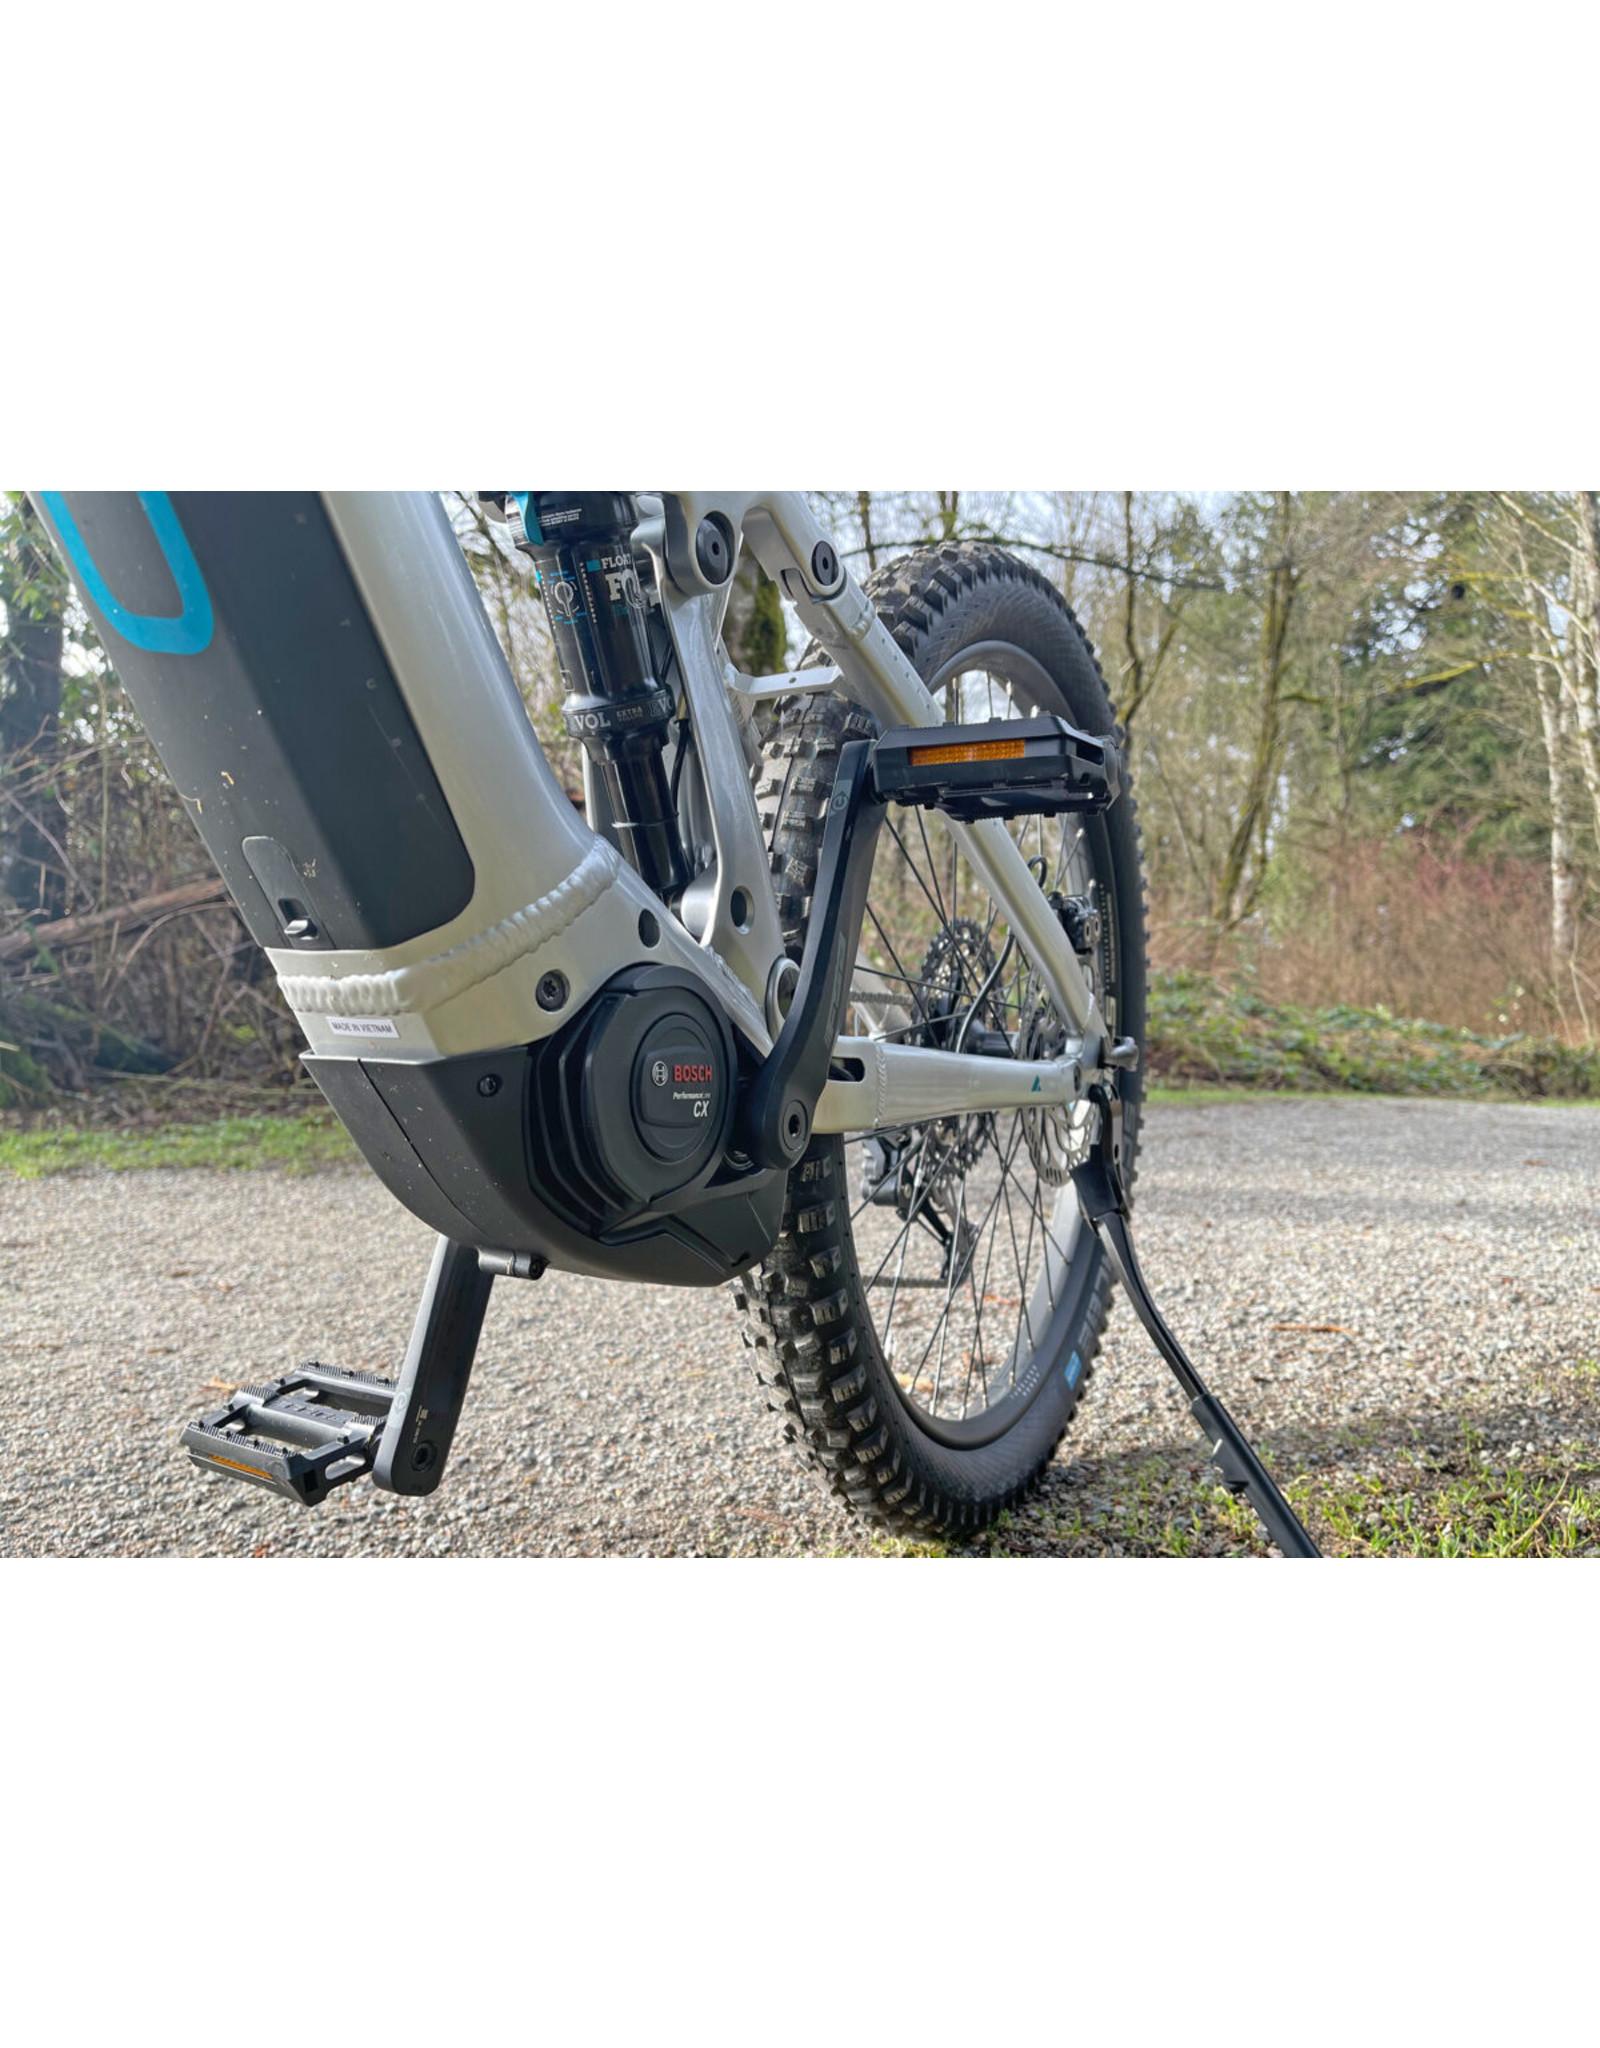 BULLS Bulls adventure evo am silver/blue 27.5 41cm dual battery fully suspended mountain trail bike